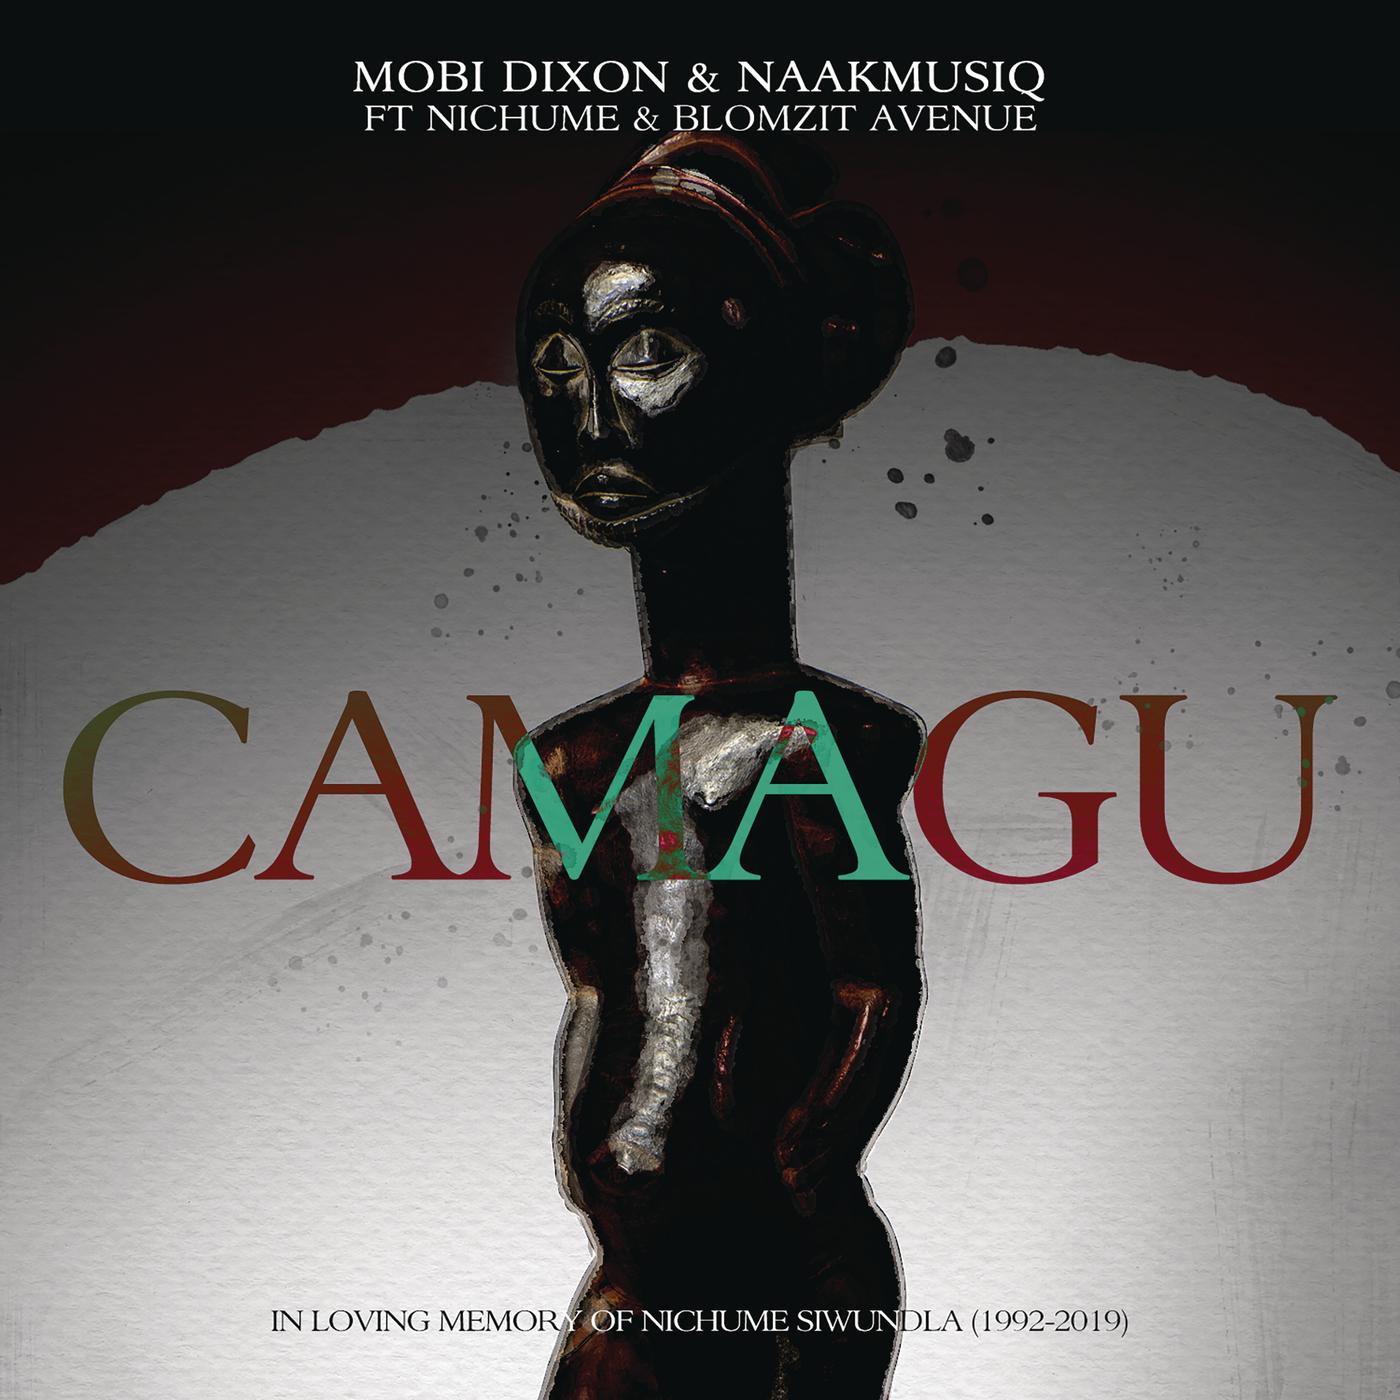 Camagu - Mobi Dixon